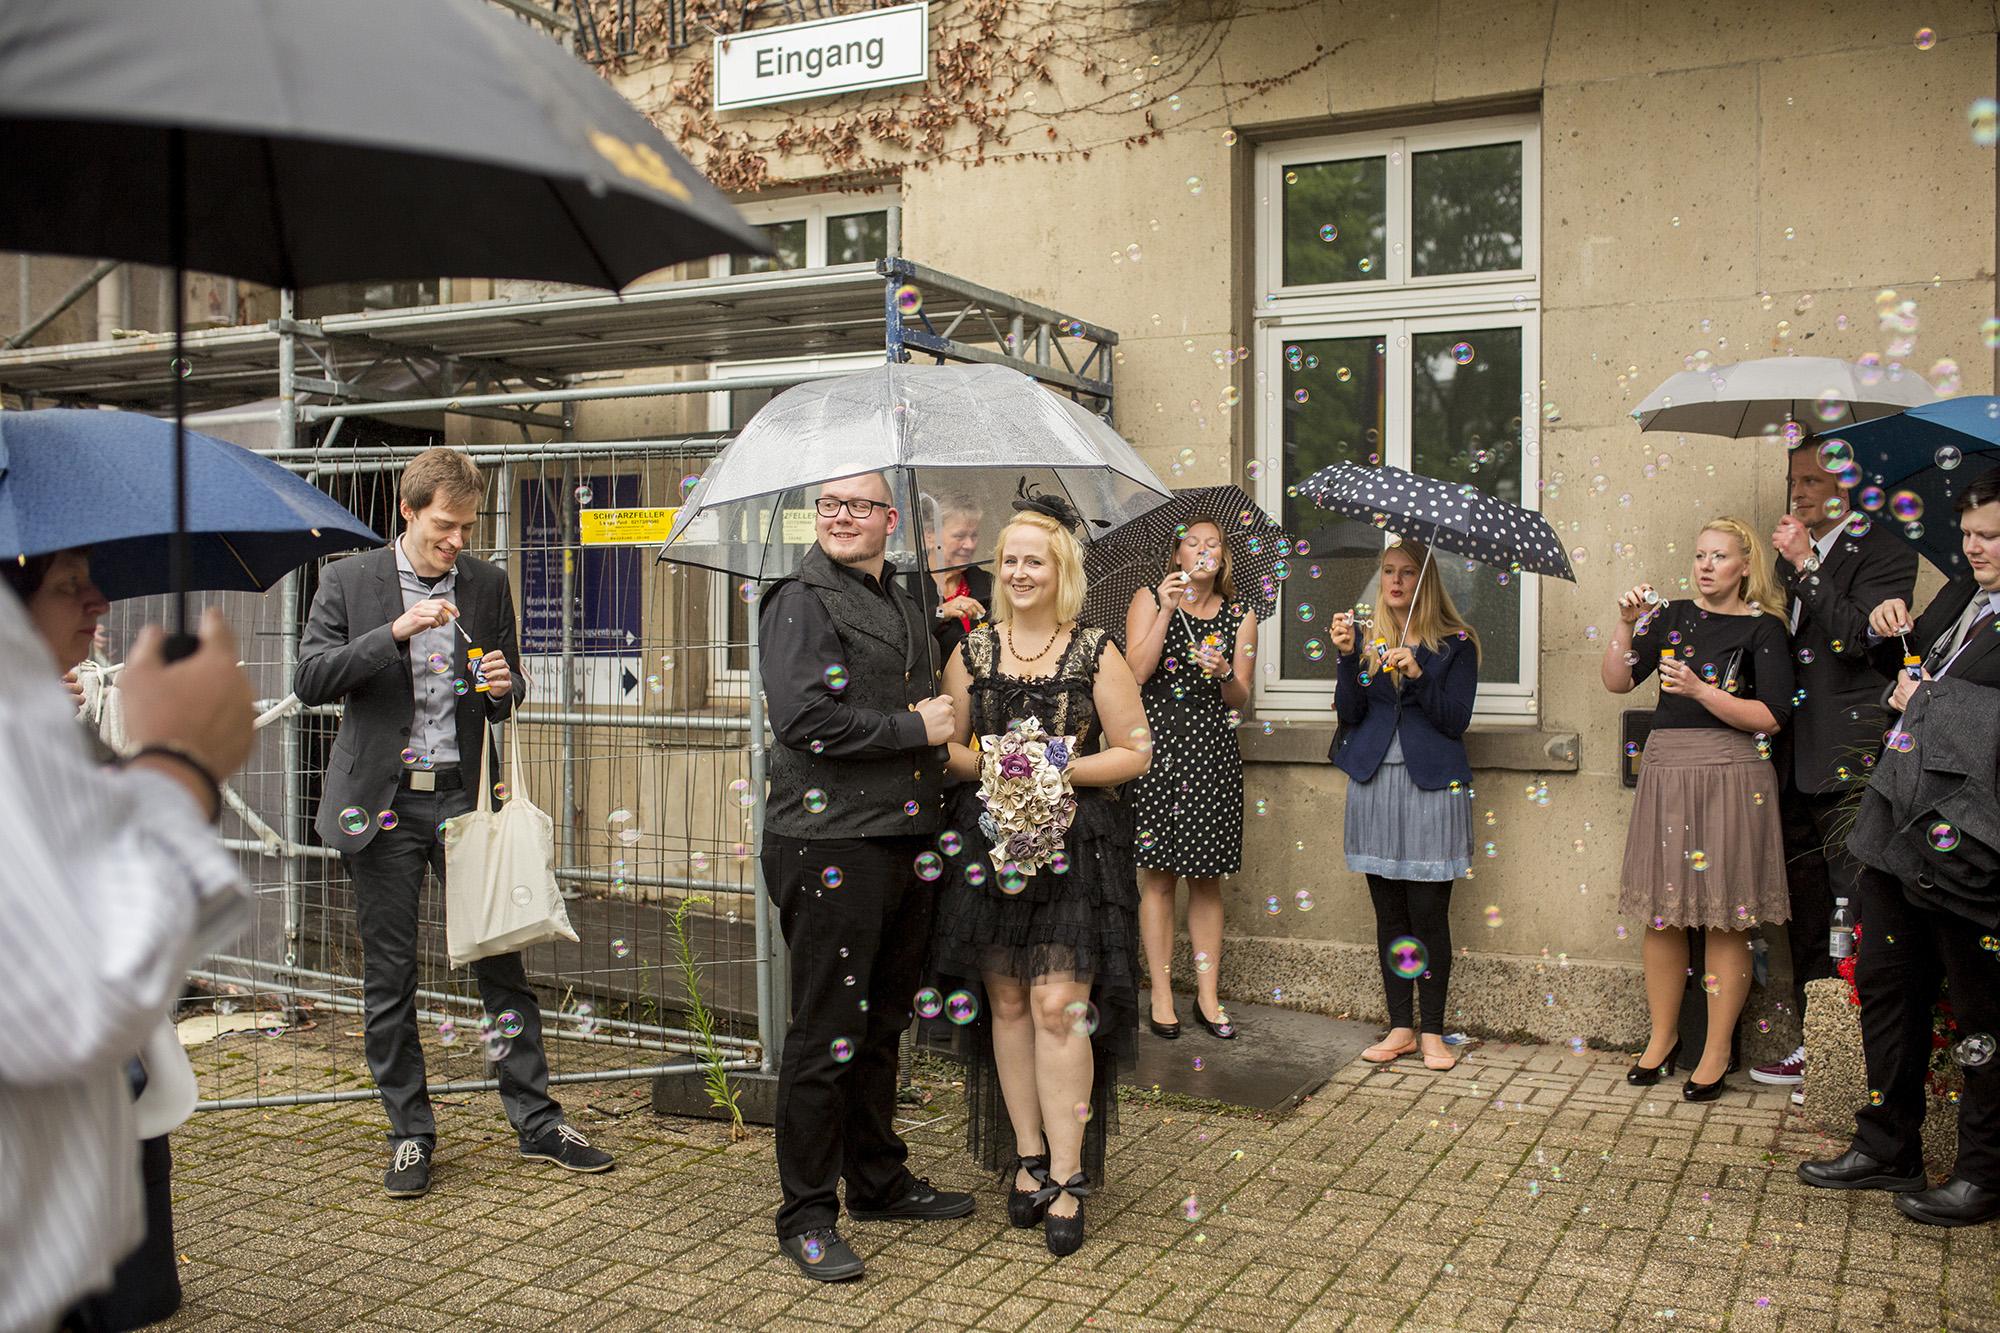 Seriously_Sabrina_Photography_Essen_Germany_RocknRoll_Hochzeit_Wedding_PatrickJenny47.jpg